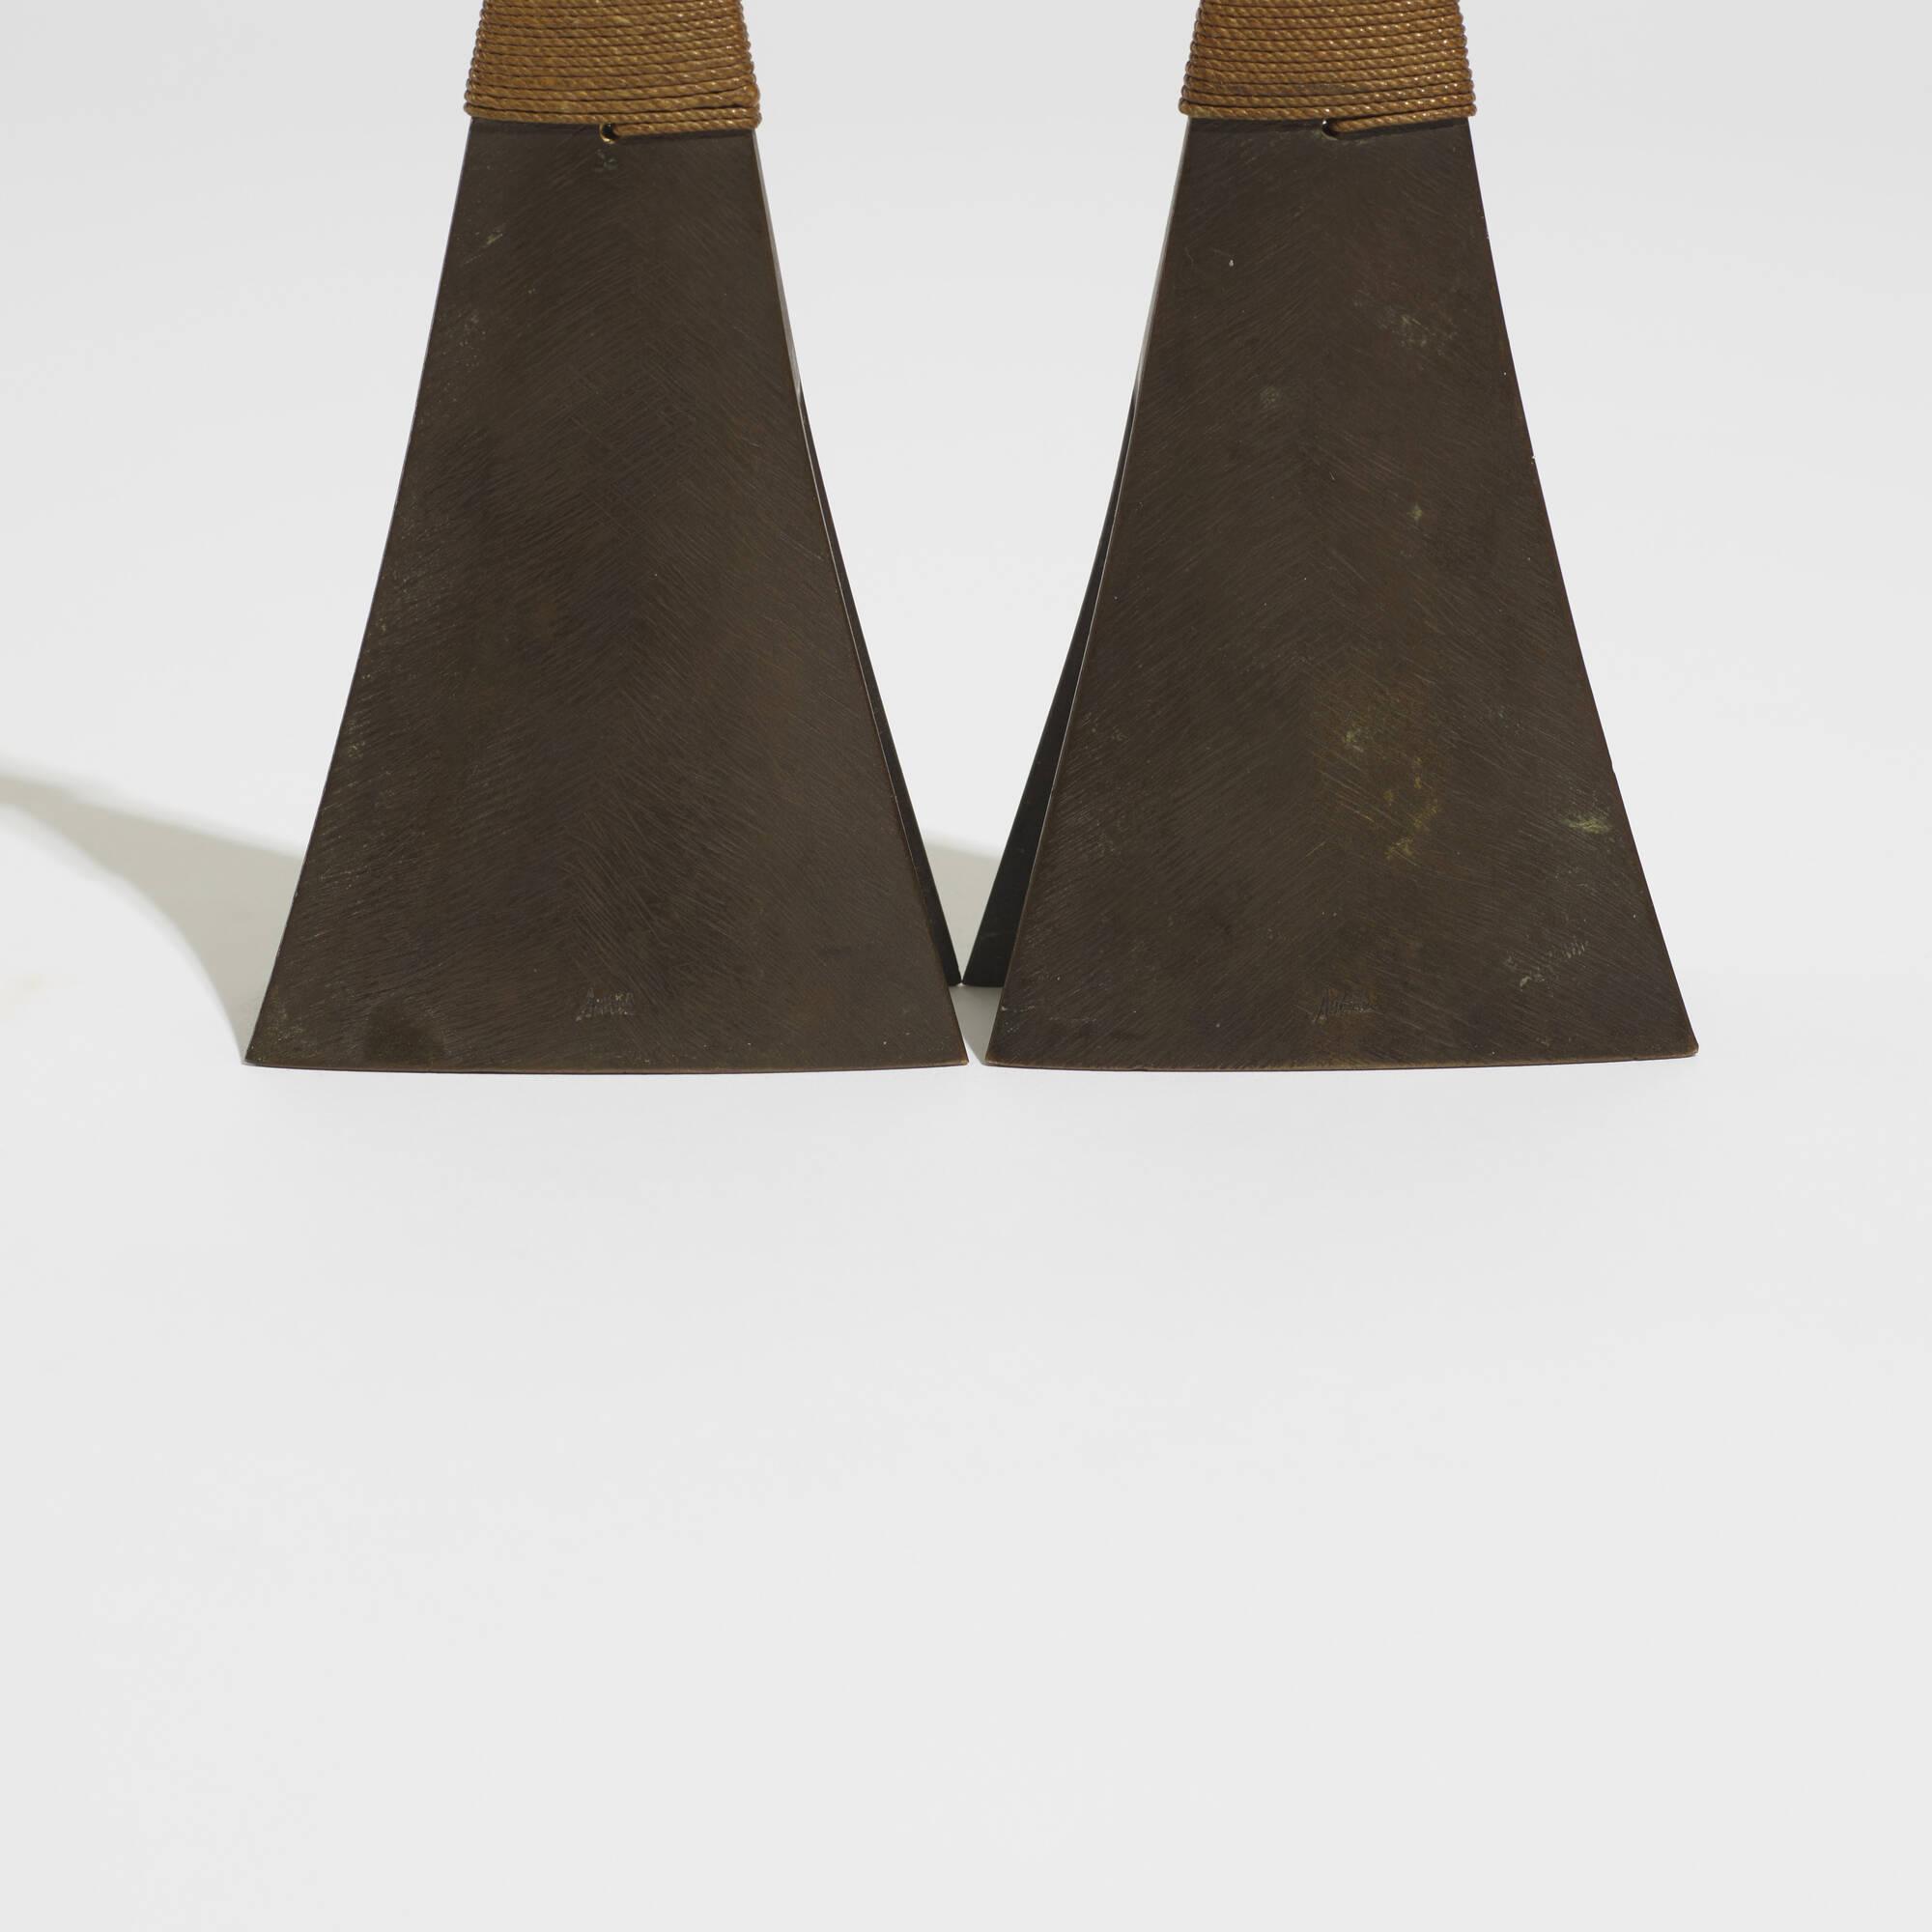 260: Carl Auböck II / rare candlesticks model 3502, pair (3 of 3)